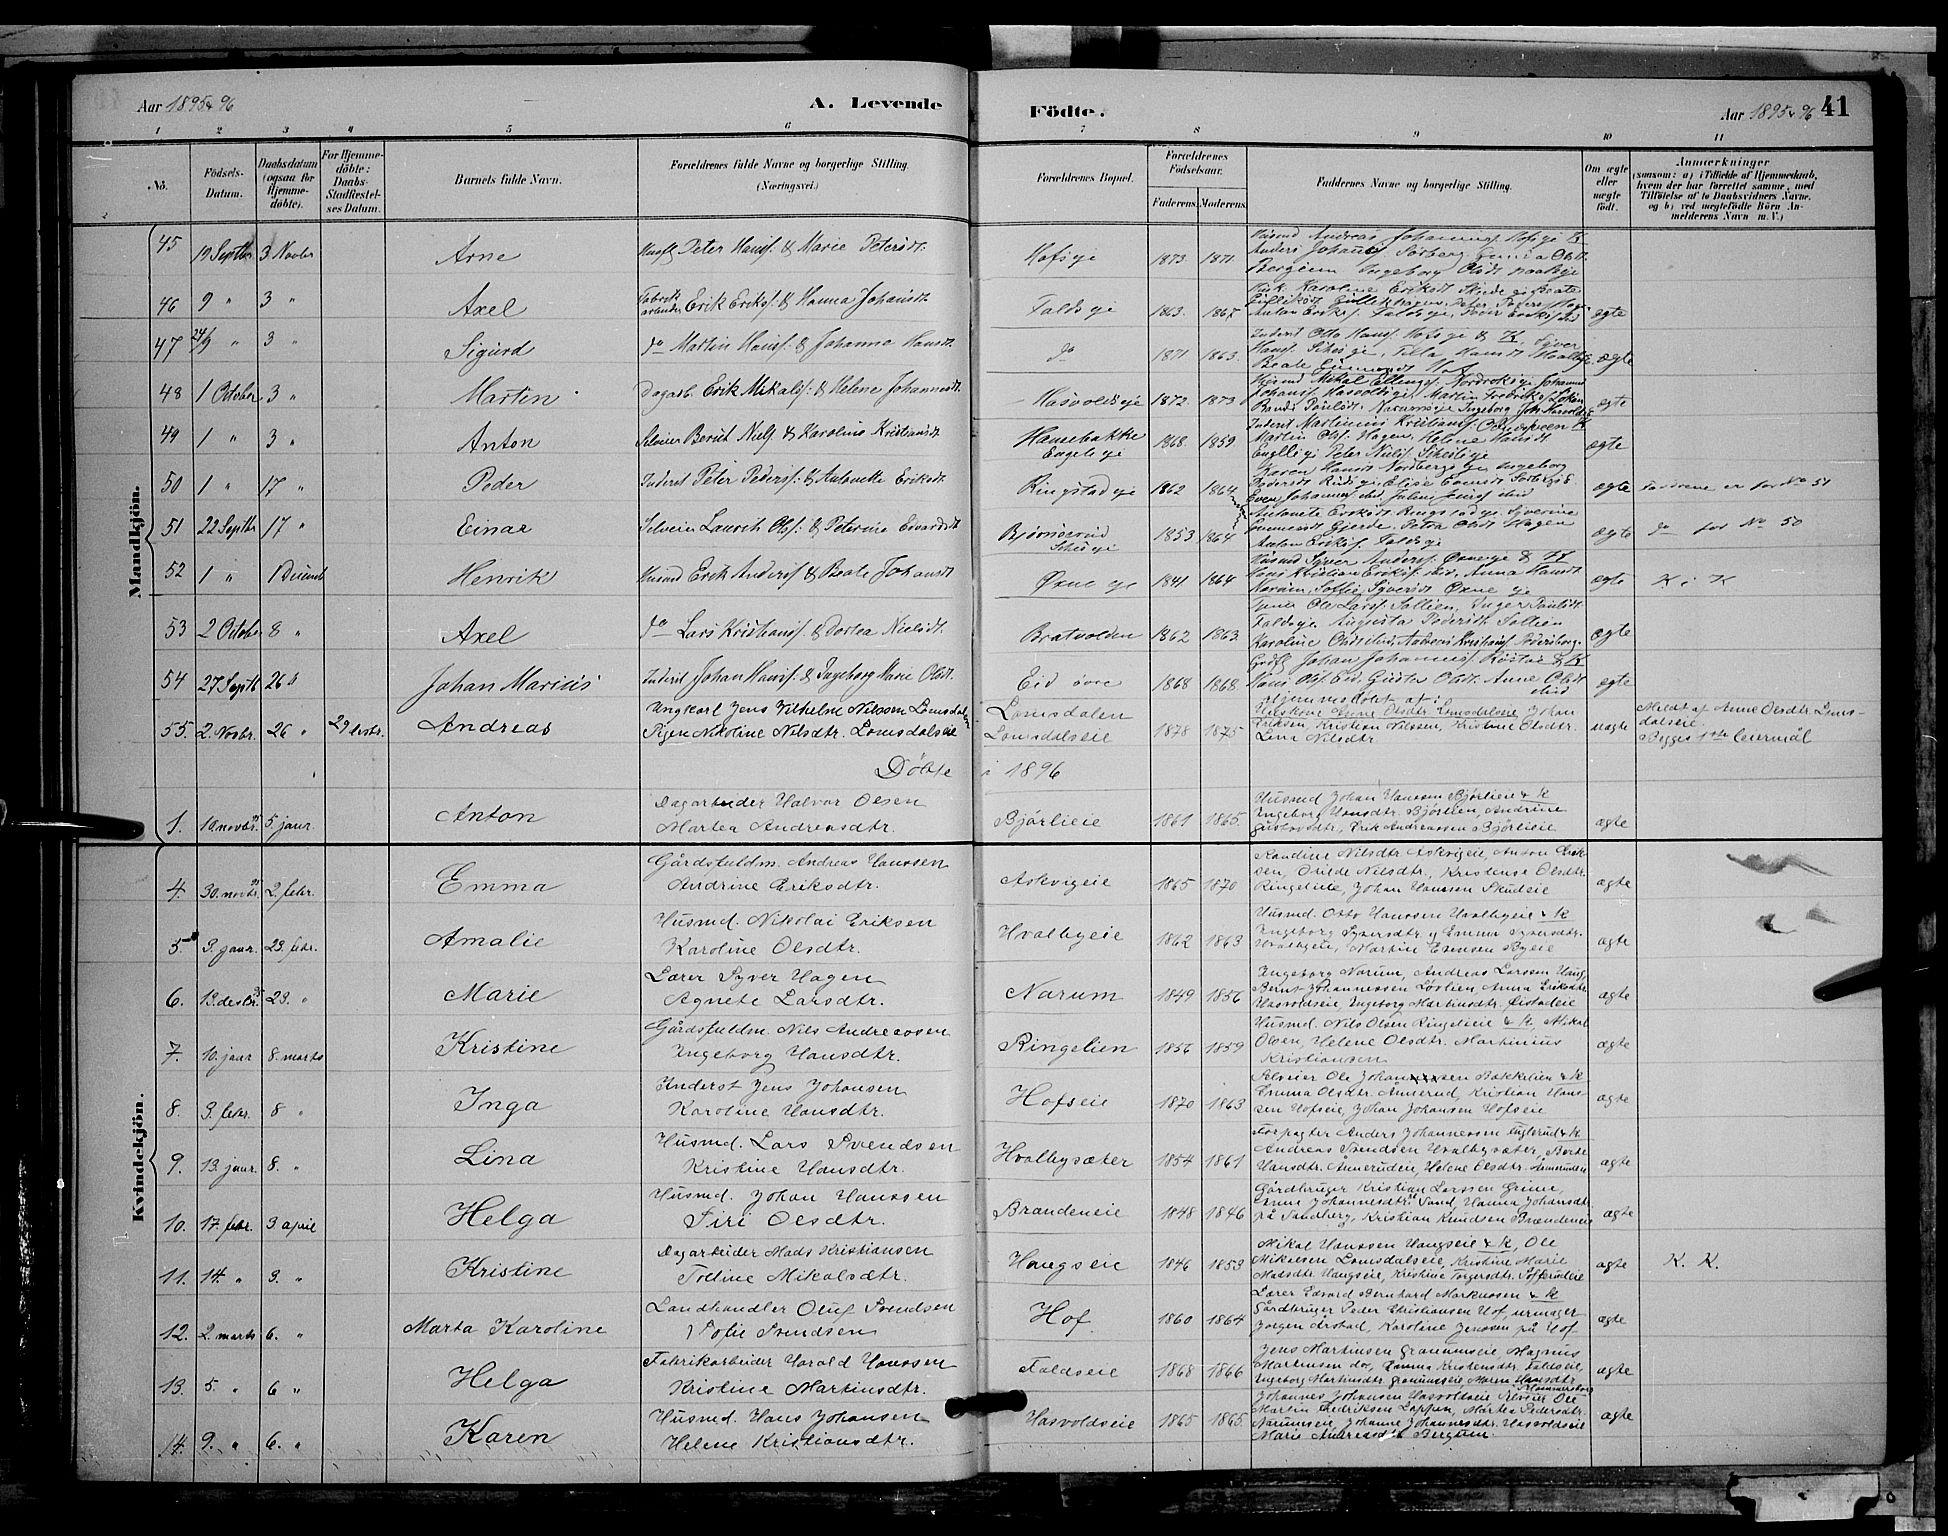 SAH, Søndre Land prestekontor, L/L0002: Klokkerbok nr. 2, 1884-1900, s. 41